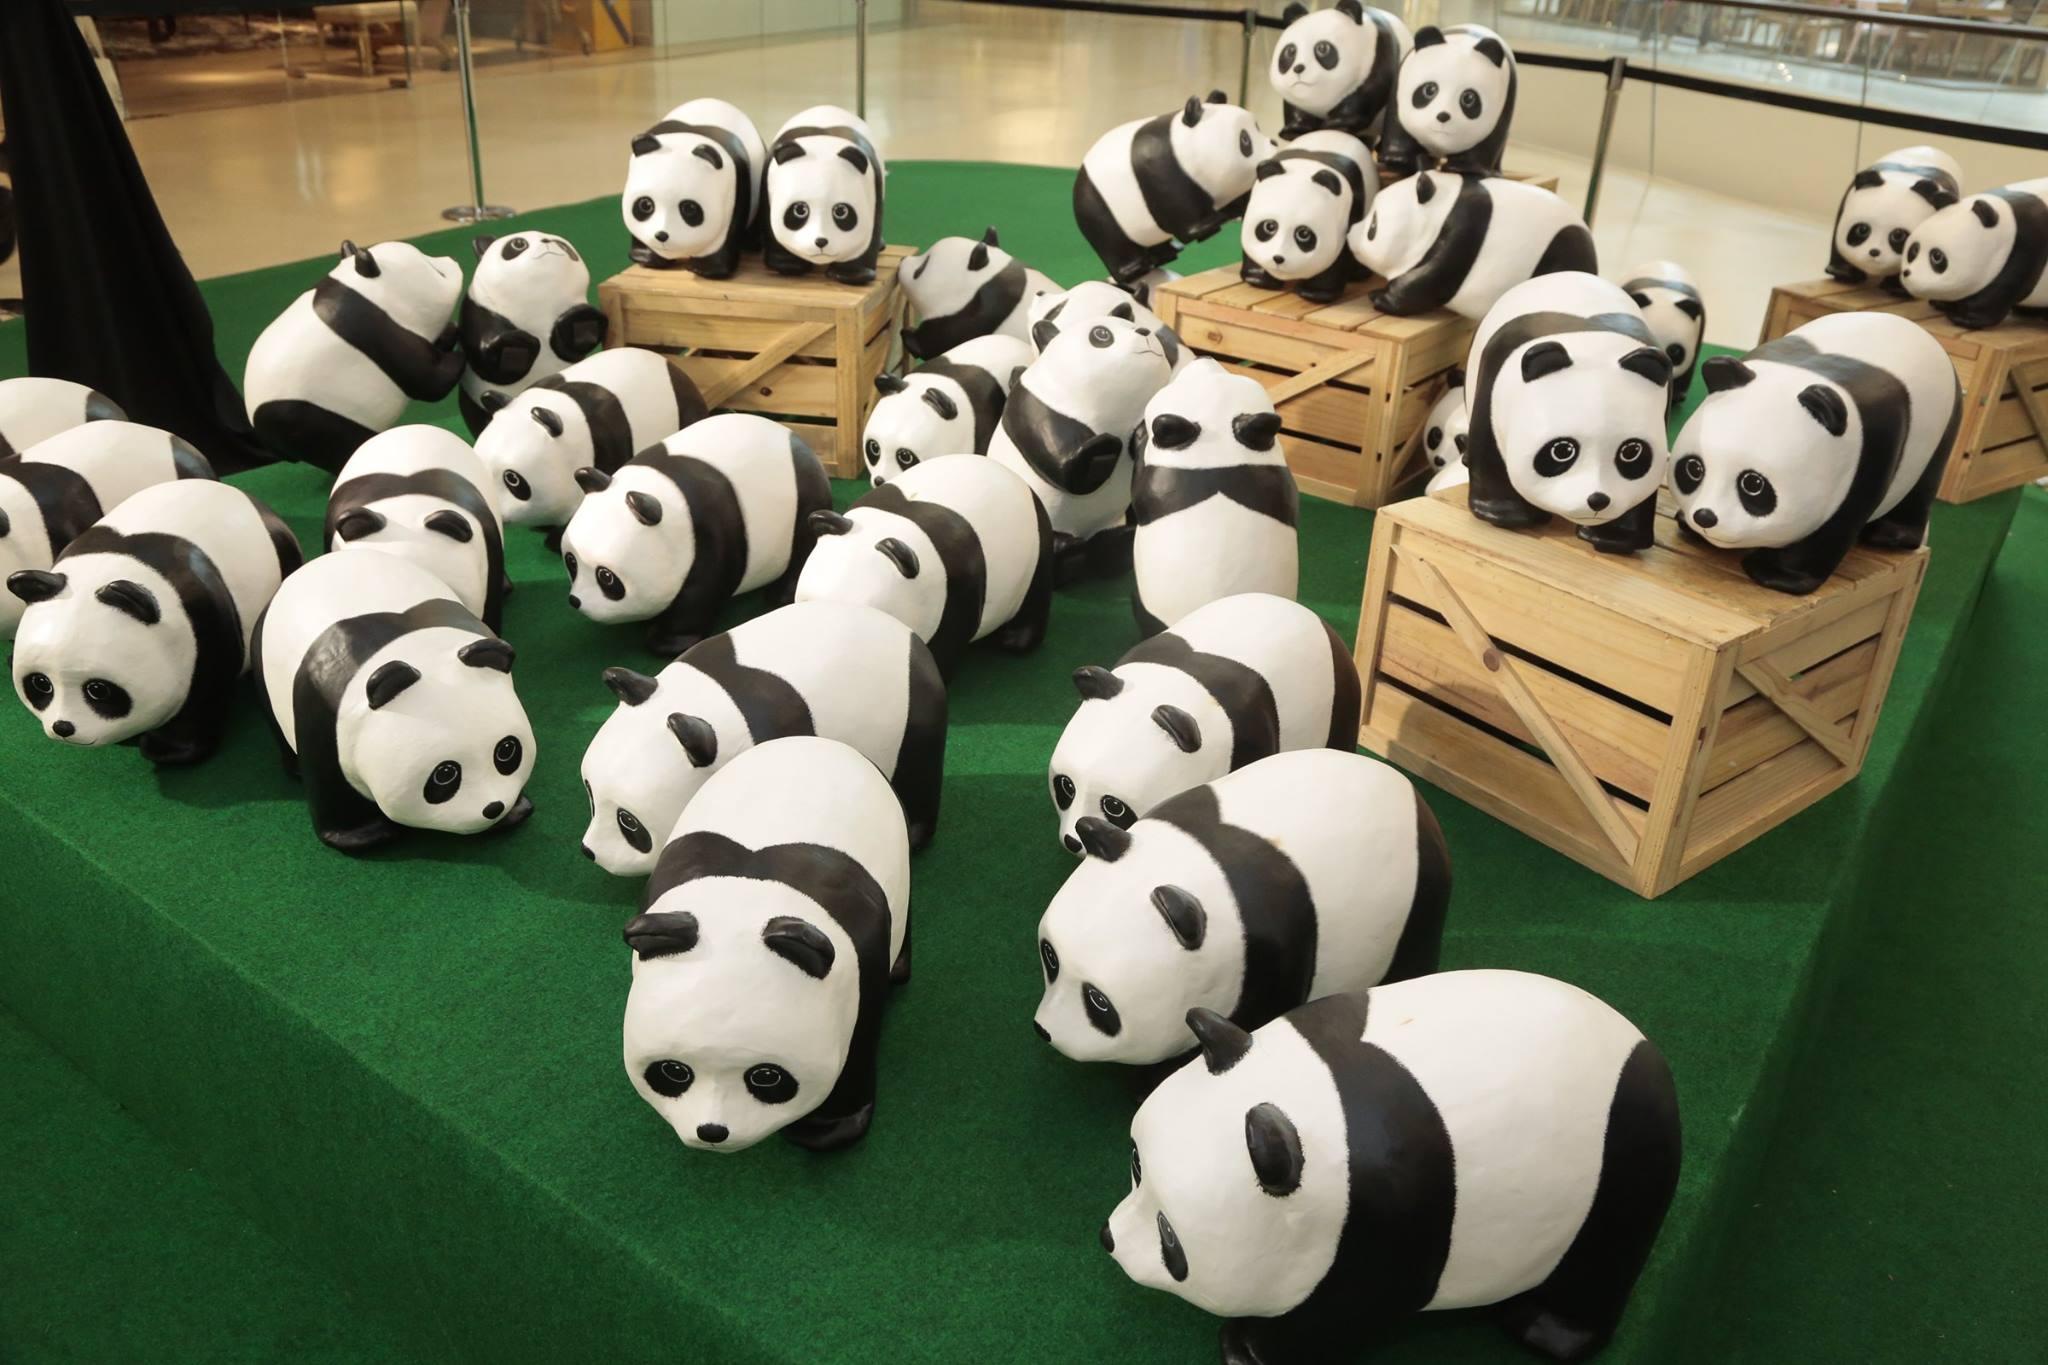 Panda ท่องเที่ยว เซ็นทรัลเอ็มบาสซี เปเปอร์มาร์เช่ แพนด้า แฟลชม็อบ